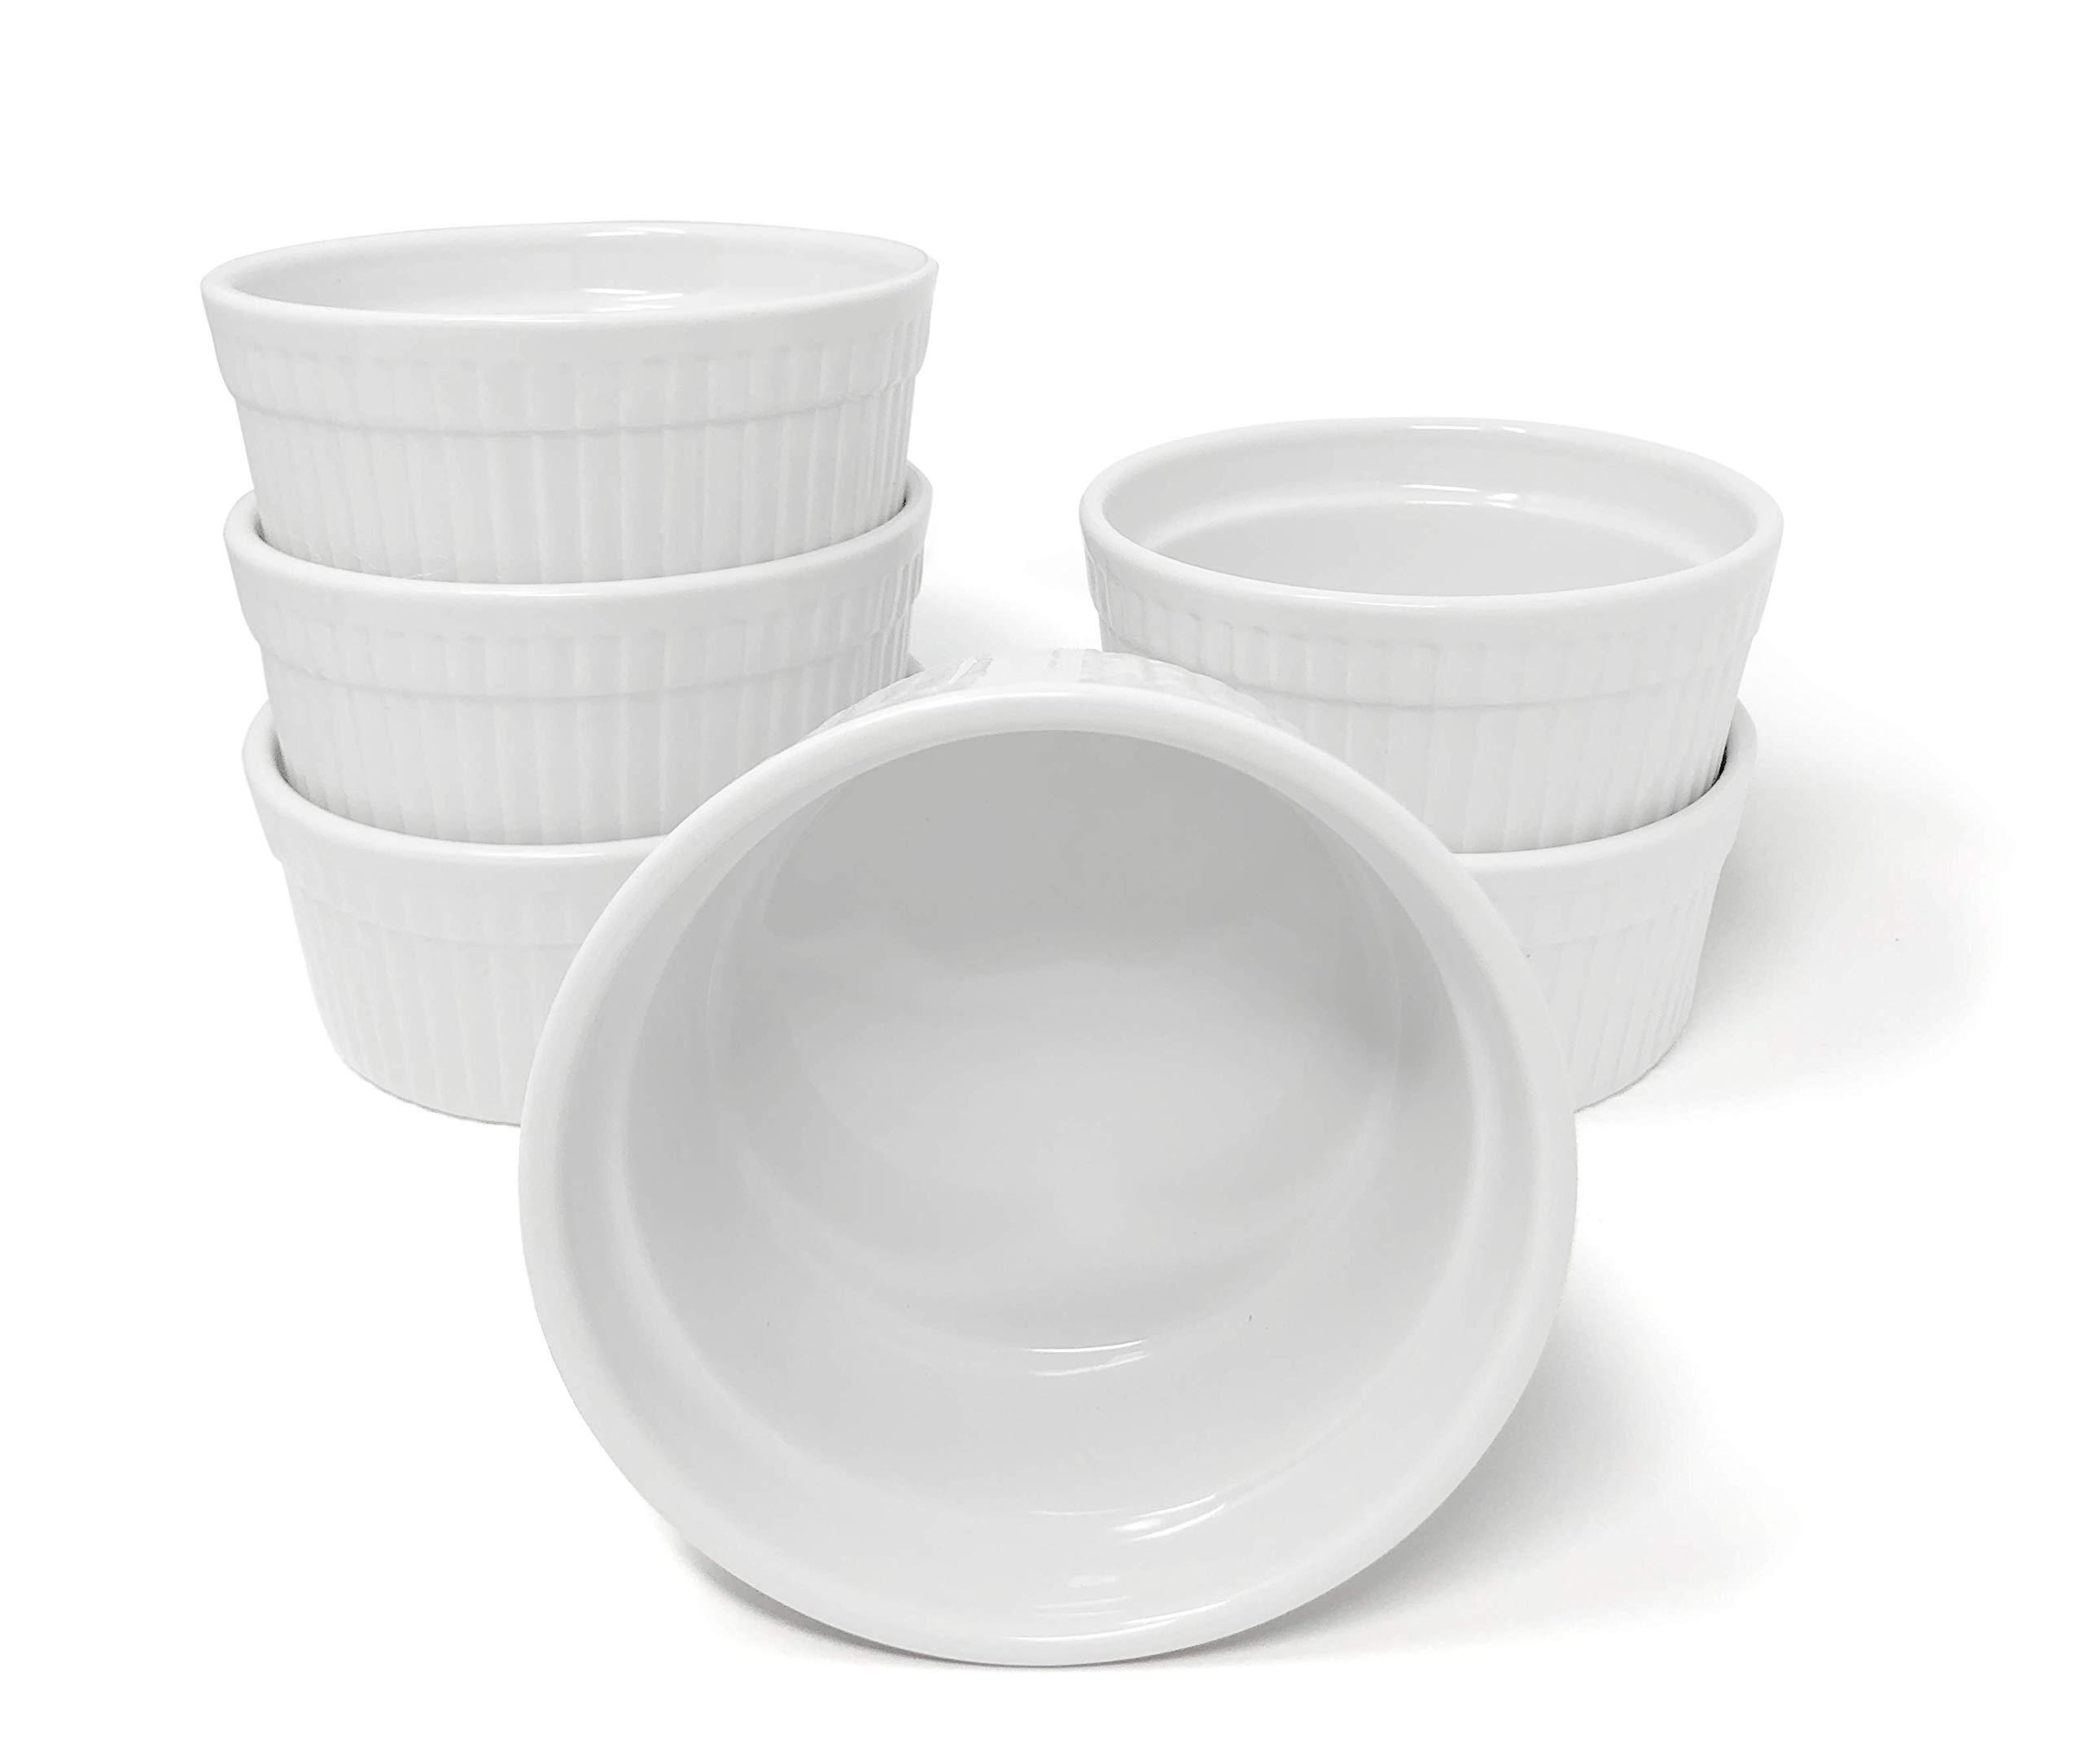 Furmaware White Porcelain 12oz Ramekins Set: 6-Piece Baking & Serving Individual Ramekin Bowls  Sturdy & Classy No Odor & Easy To Clean Ramekin Cups  Decorative Soufflé, Sauce, Dressing & Dip Ramekins